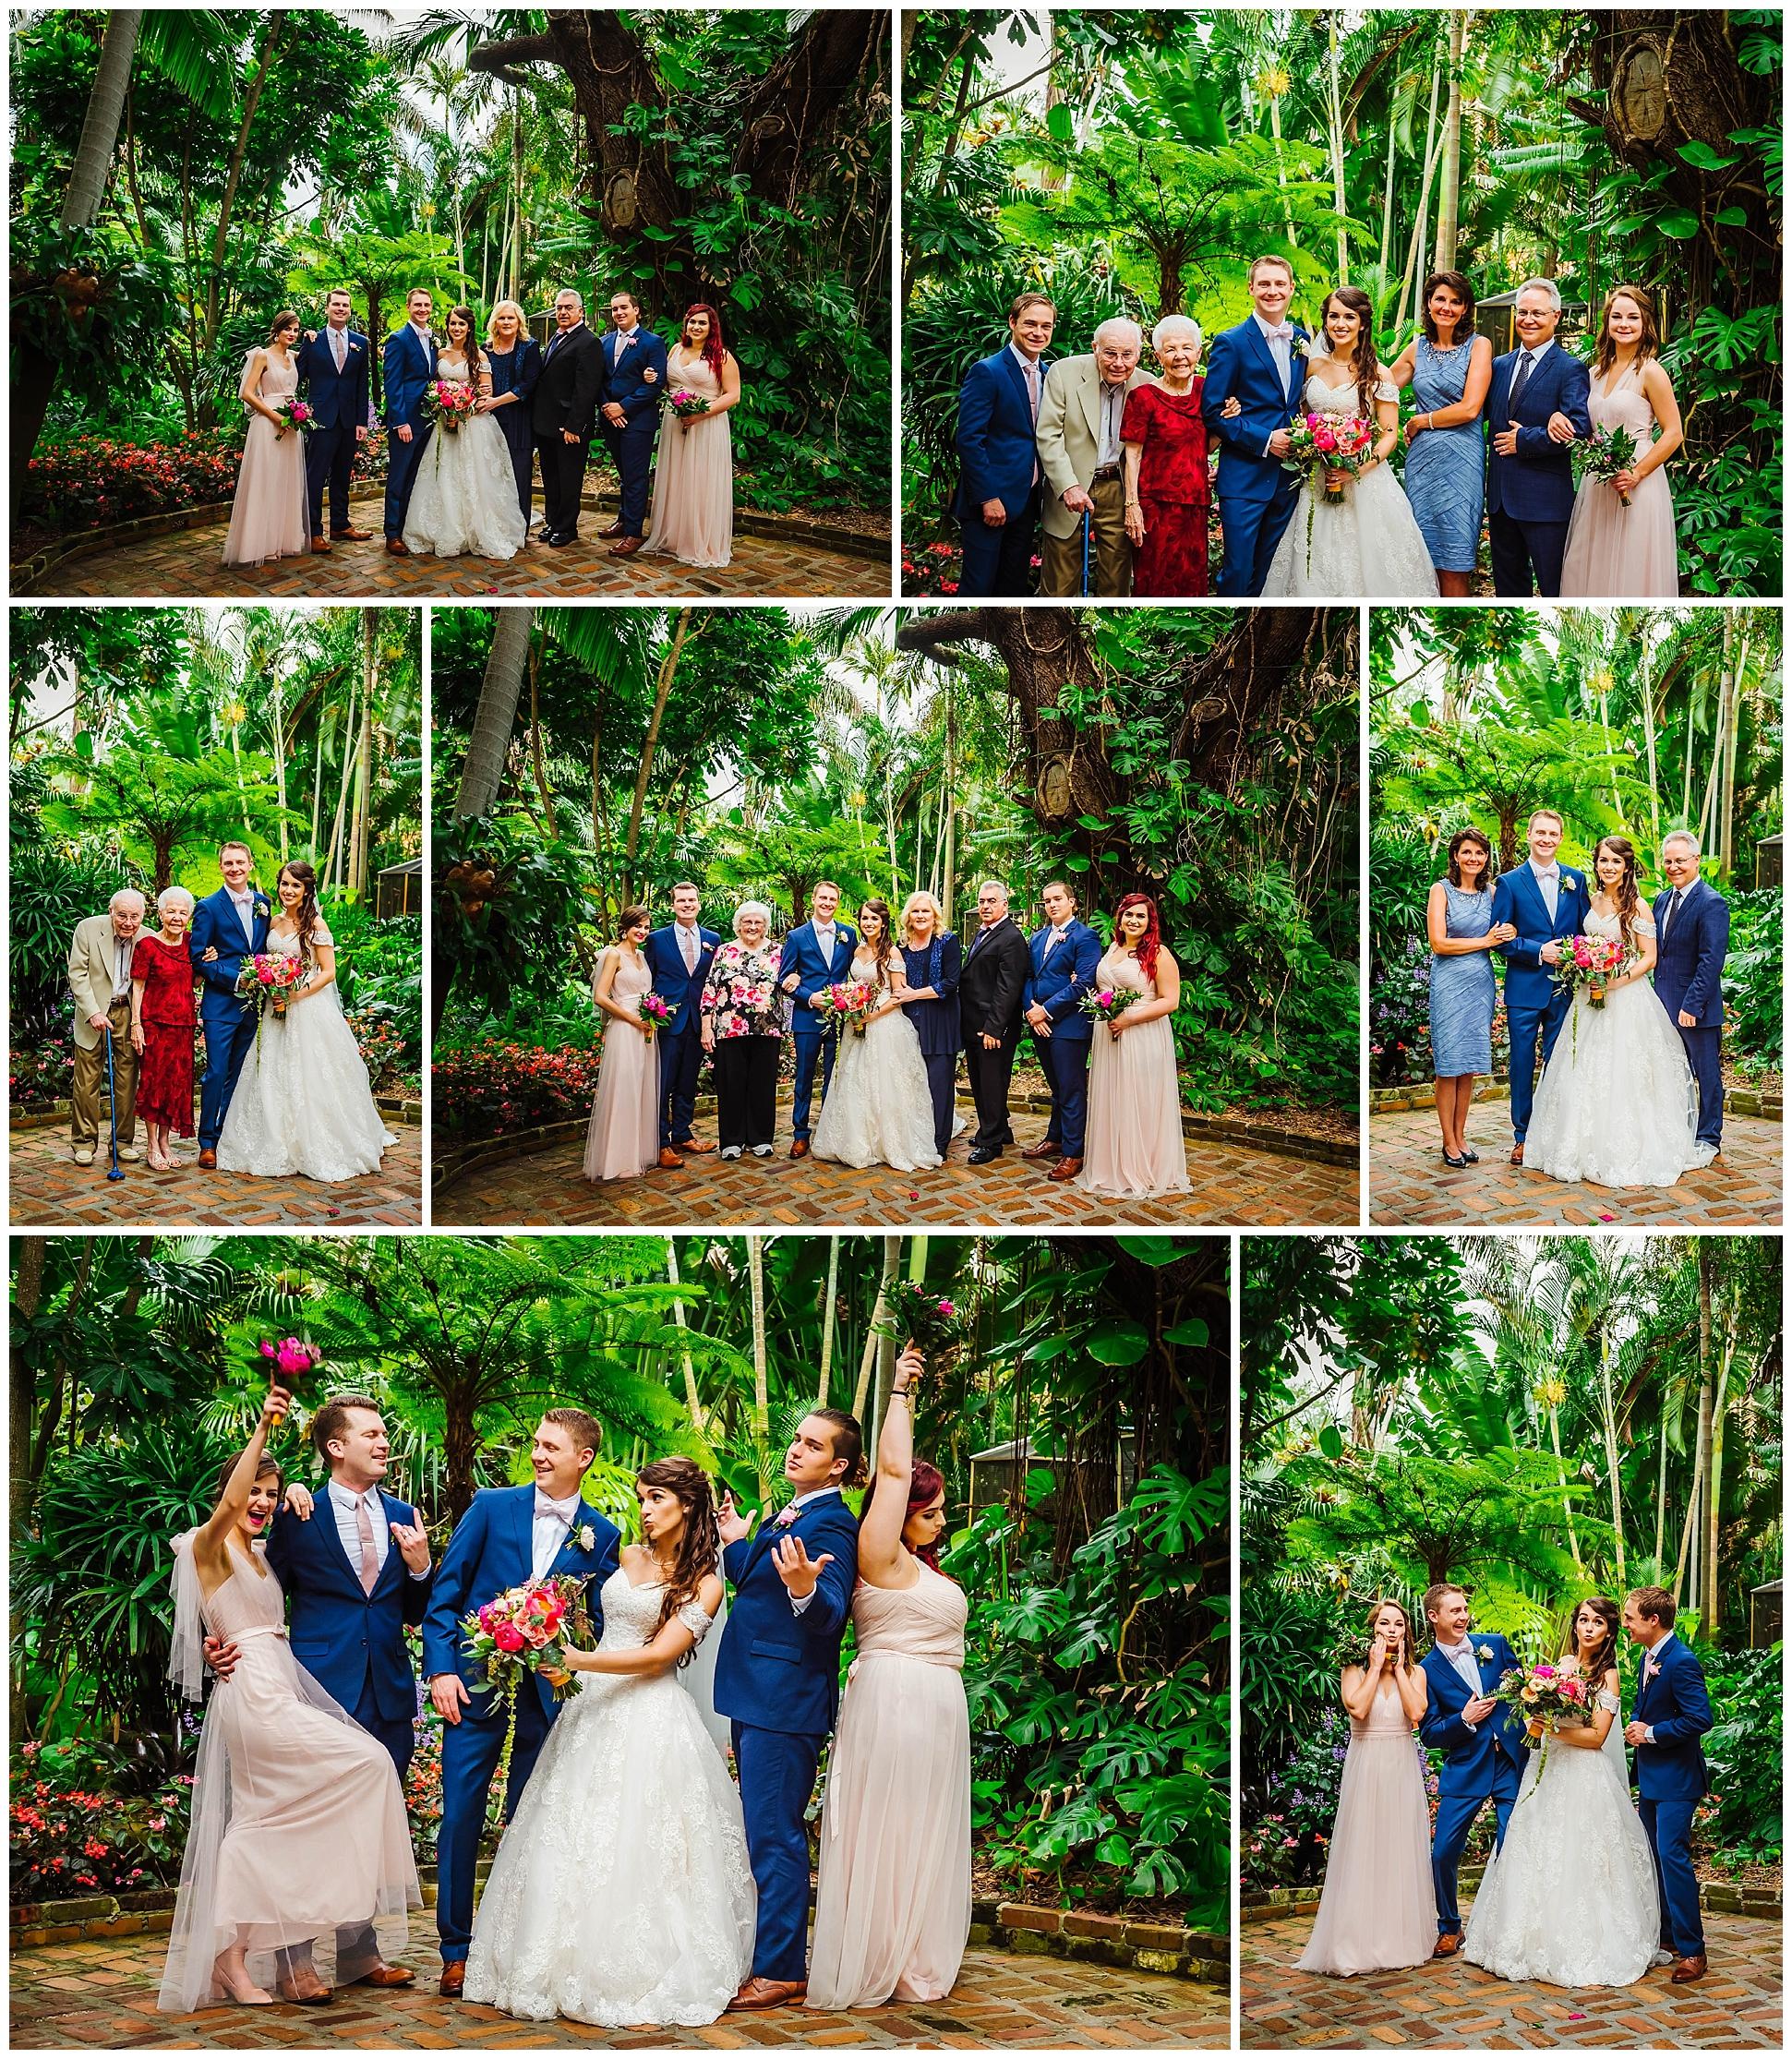 st-pete-wedding-photographer-sunken-gardens-crystal-ballroom-princess-dancer_0165.jpg